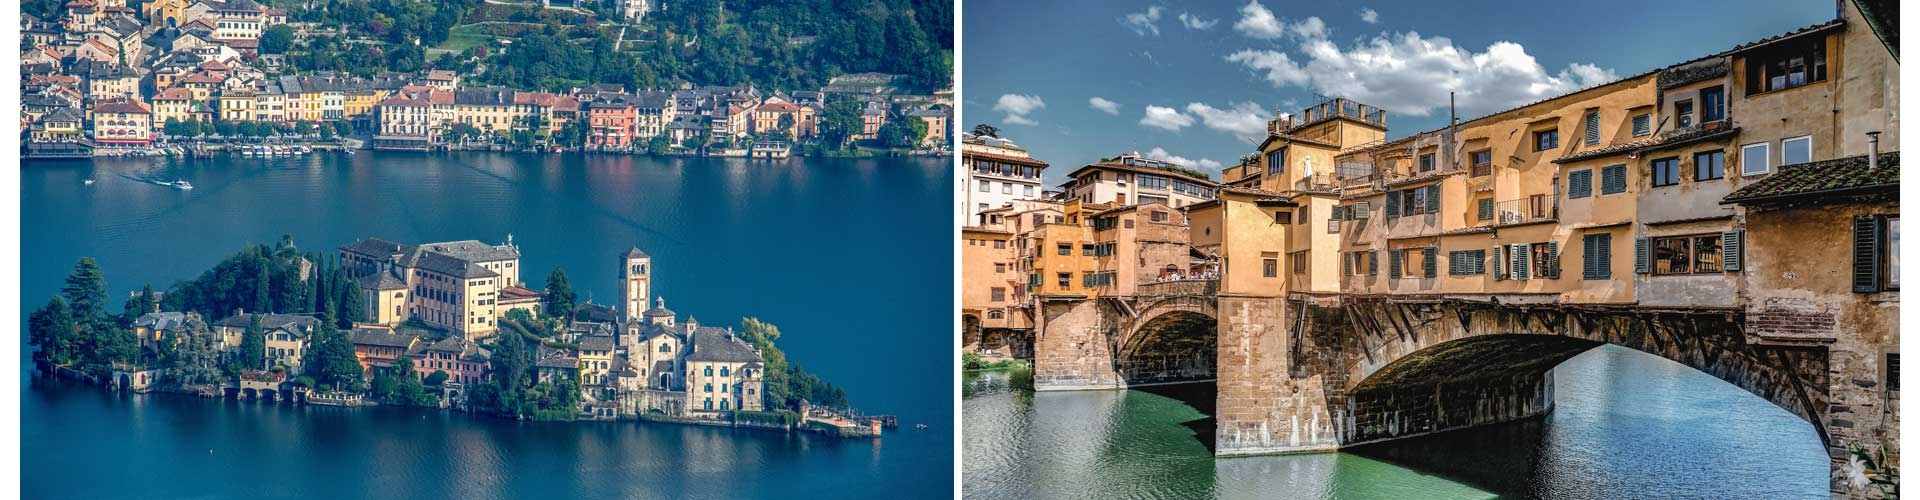 Italien Reisetagebuch europa florenz brücke see lago maggiore